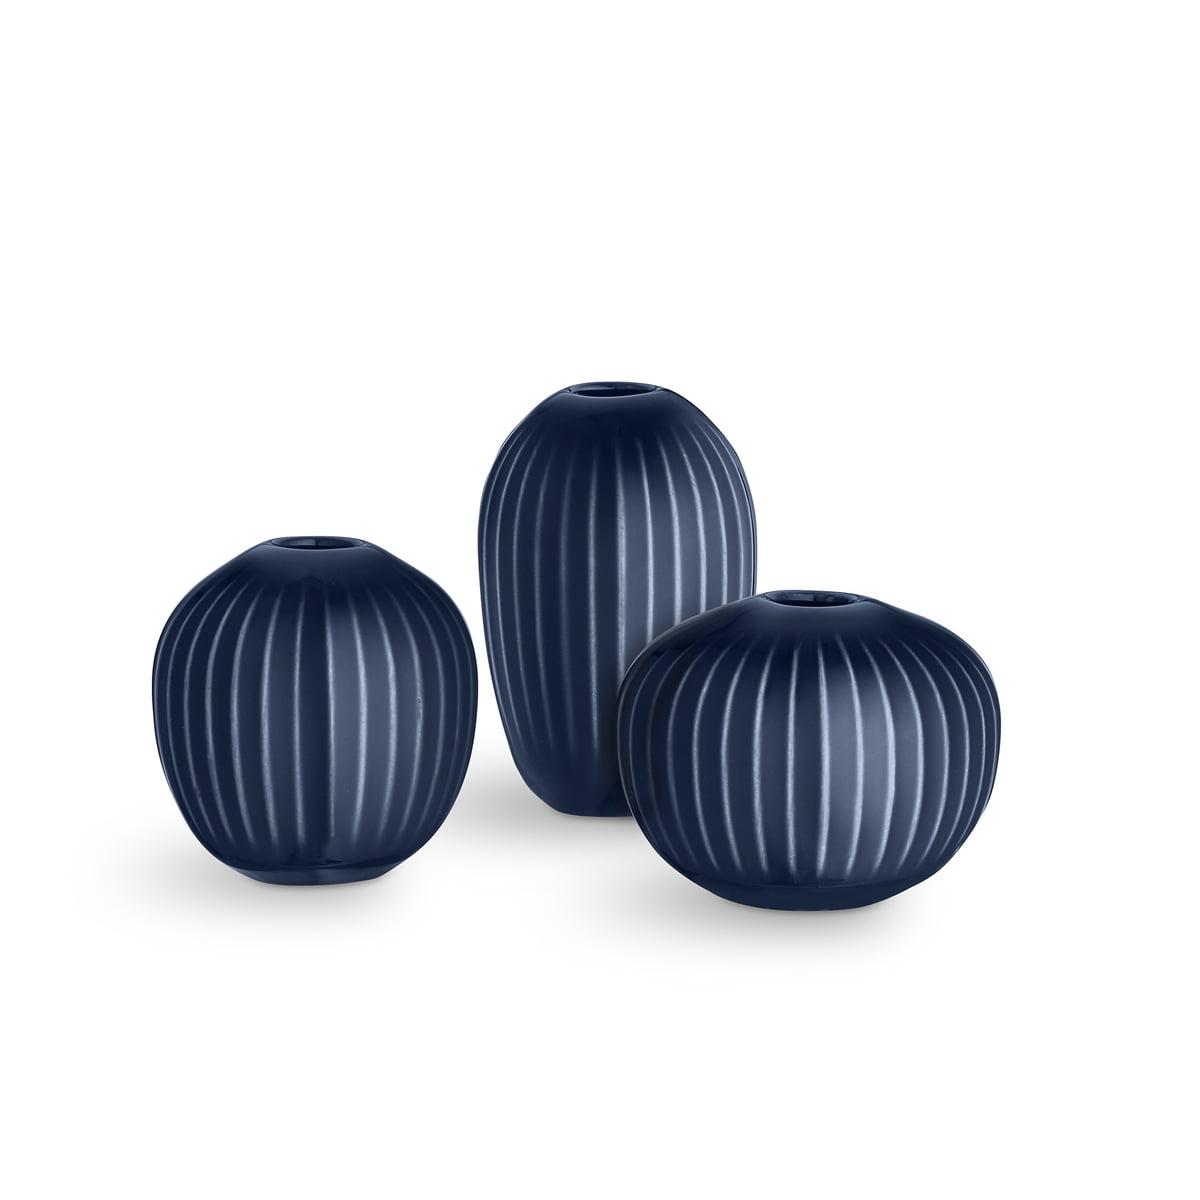 Christbaumkugeln Mini.Kahler Design Hammershoi Vase Miniatur Indigo 3er Set